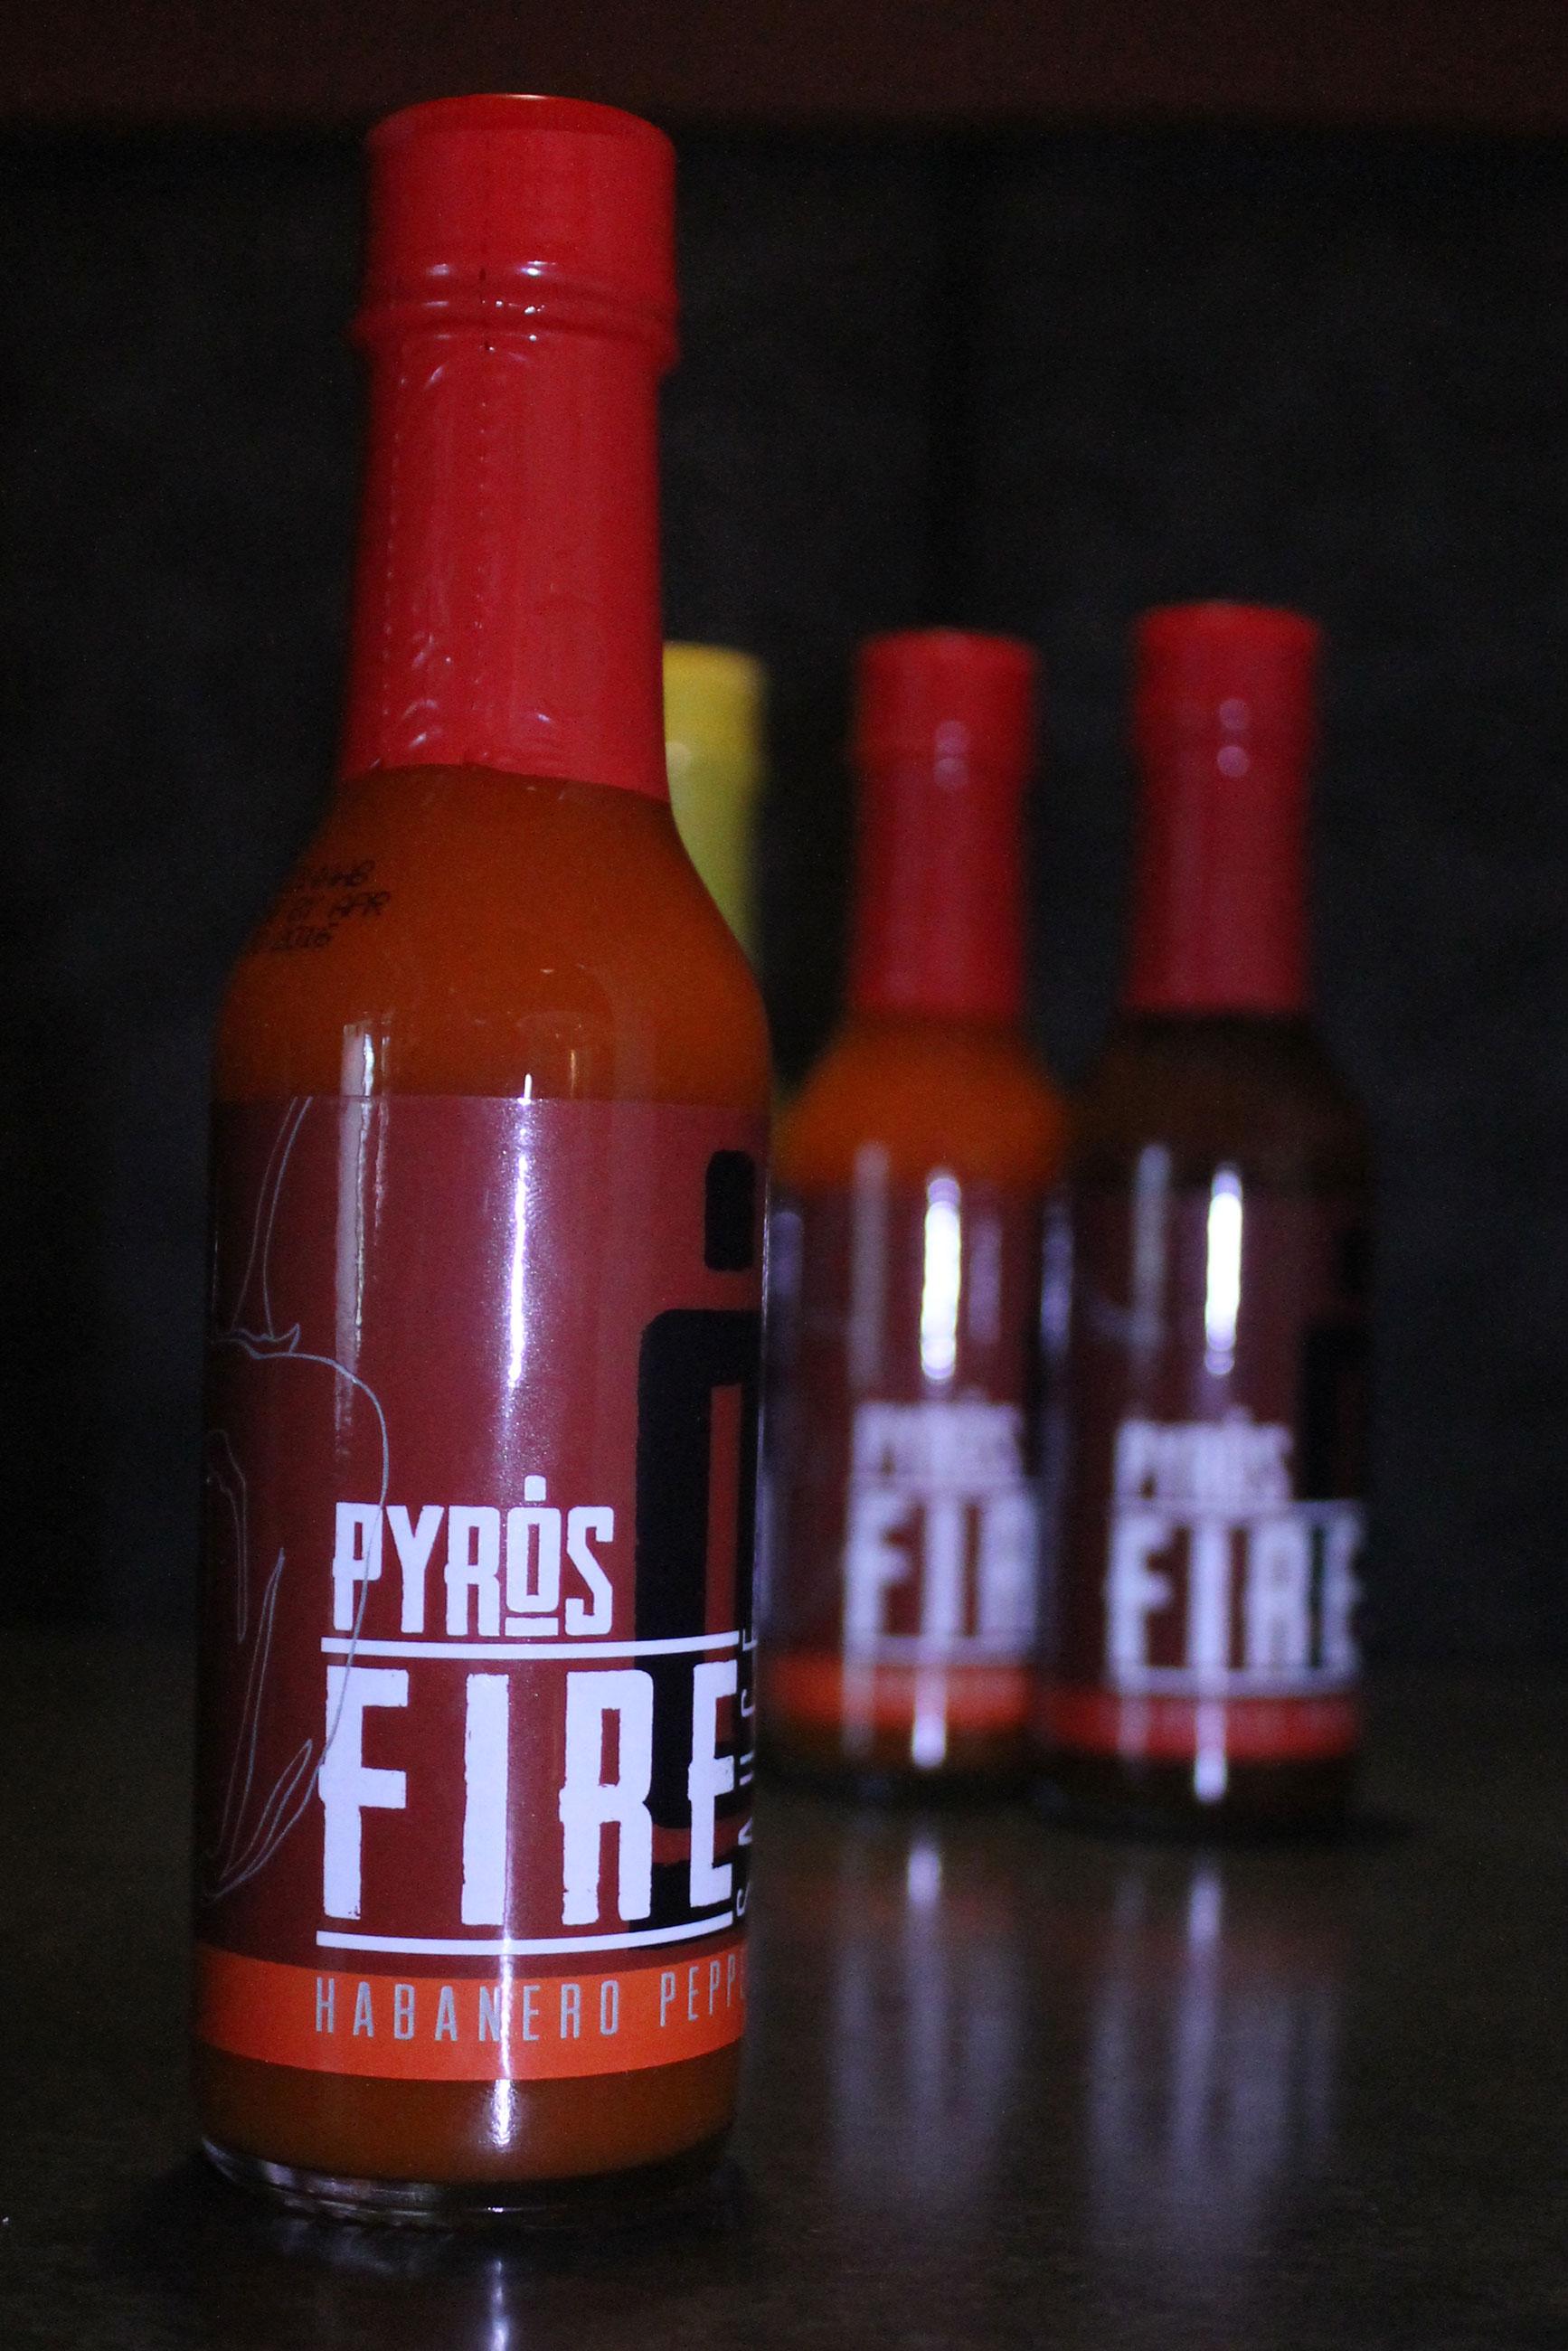 009_pyros-hotsauce-d.jpg